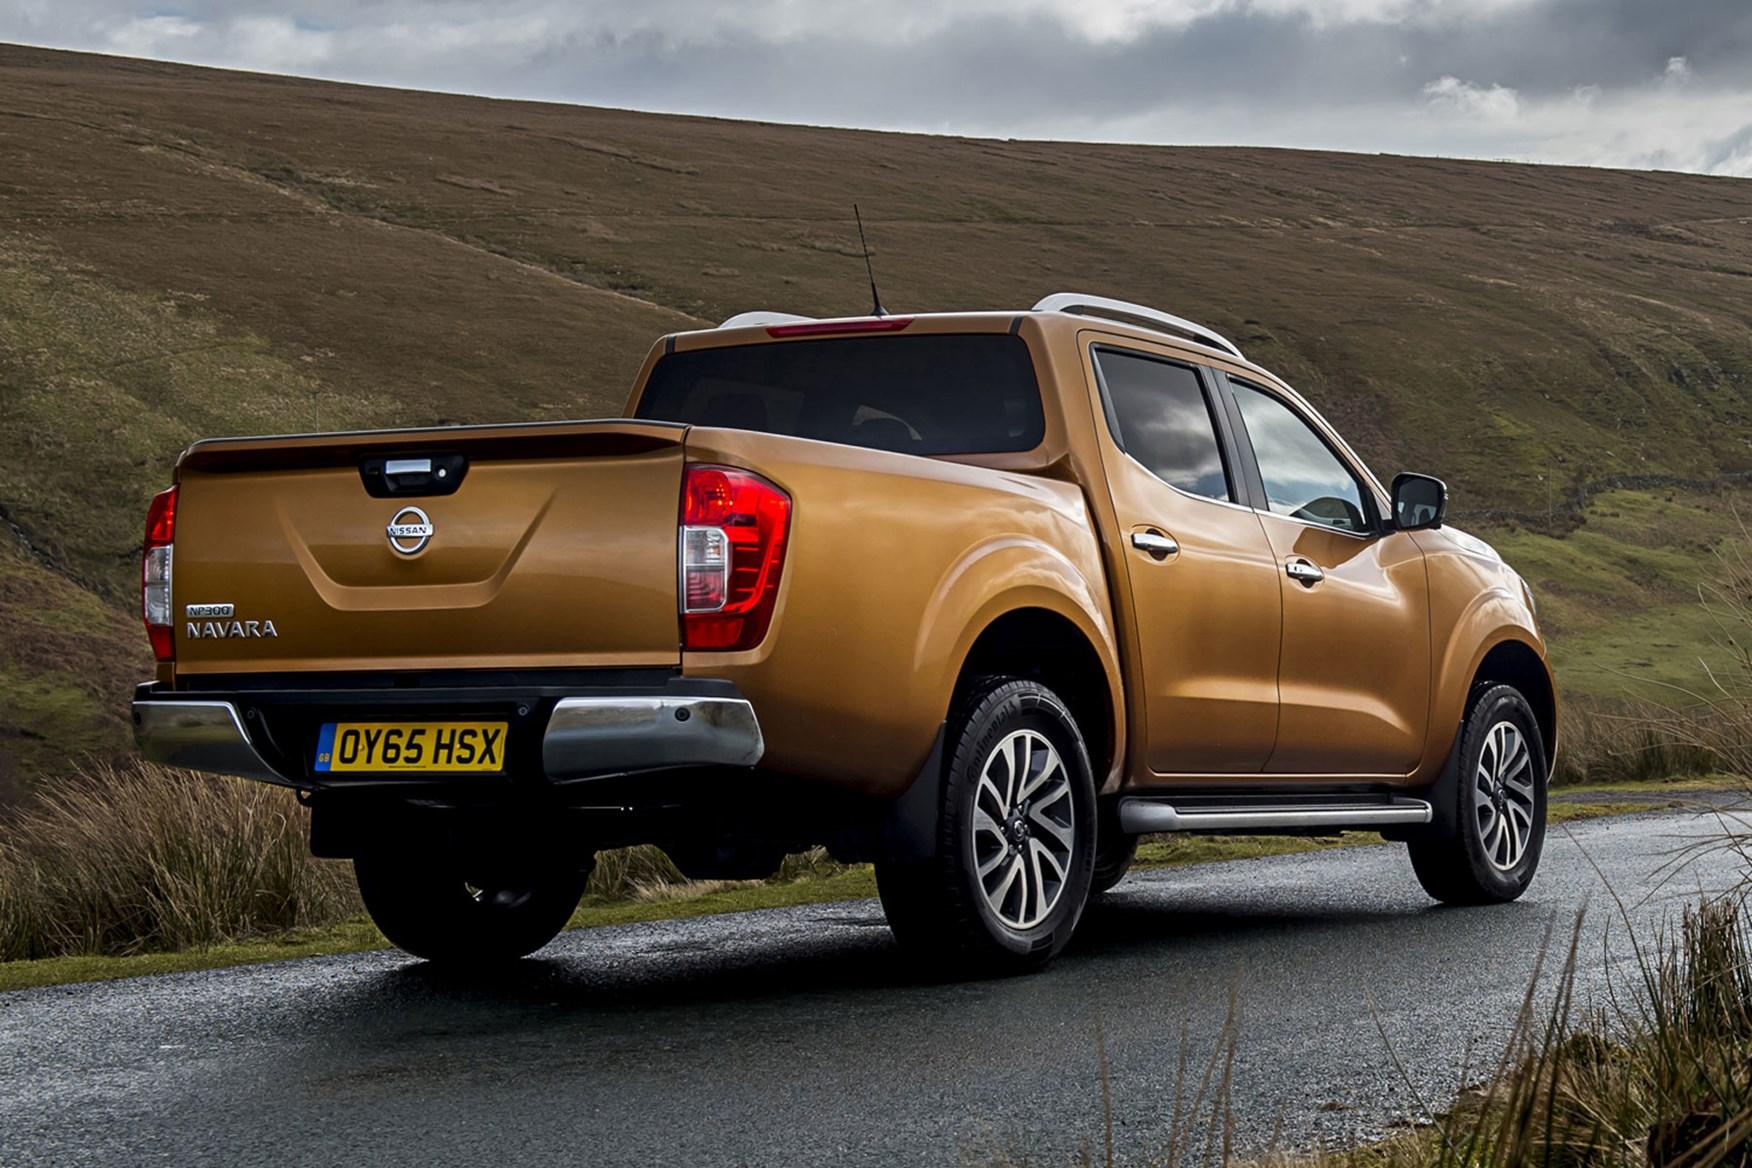 Nissan Navara review - rear view, orange